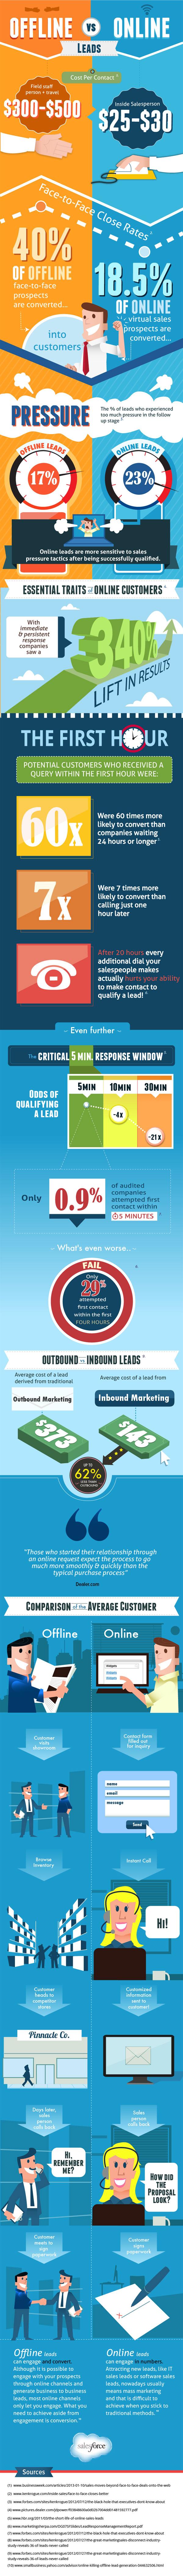 Online vs Offline Leads-Infographic